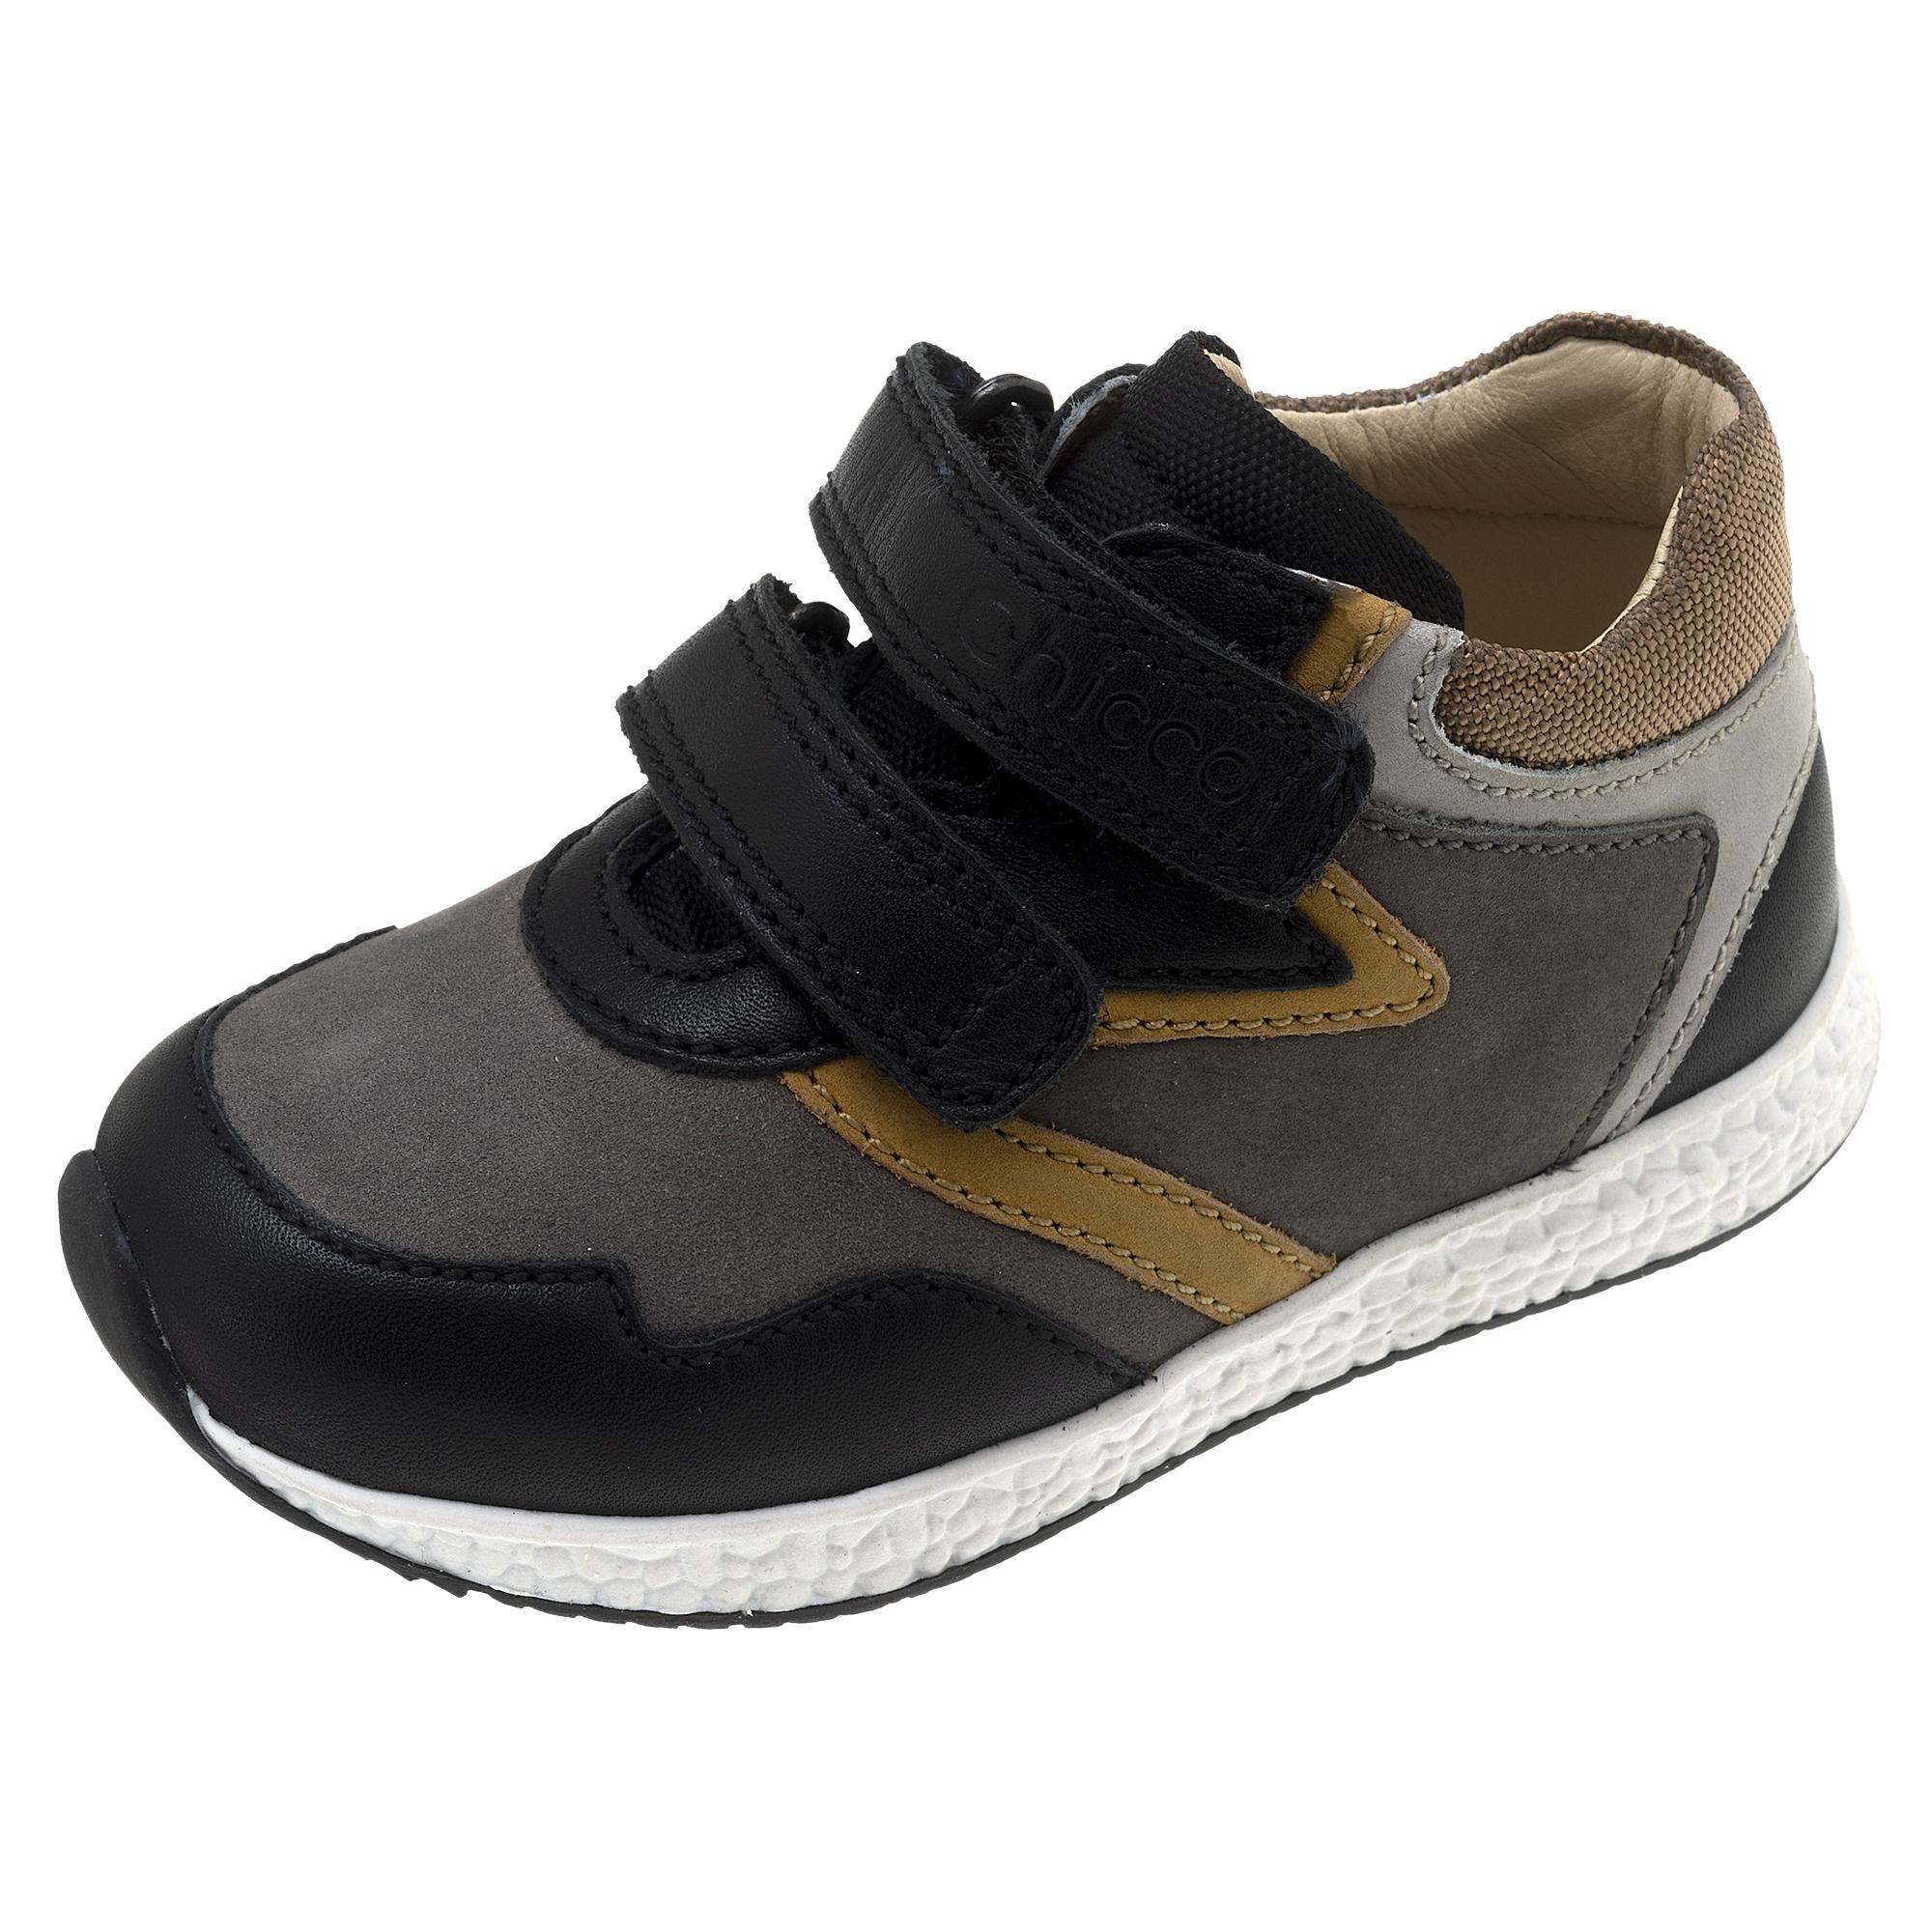 Pantofi sport copii Chicco, piele, maro, 62609